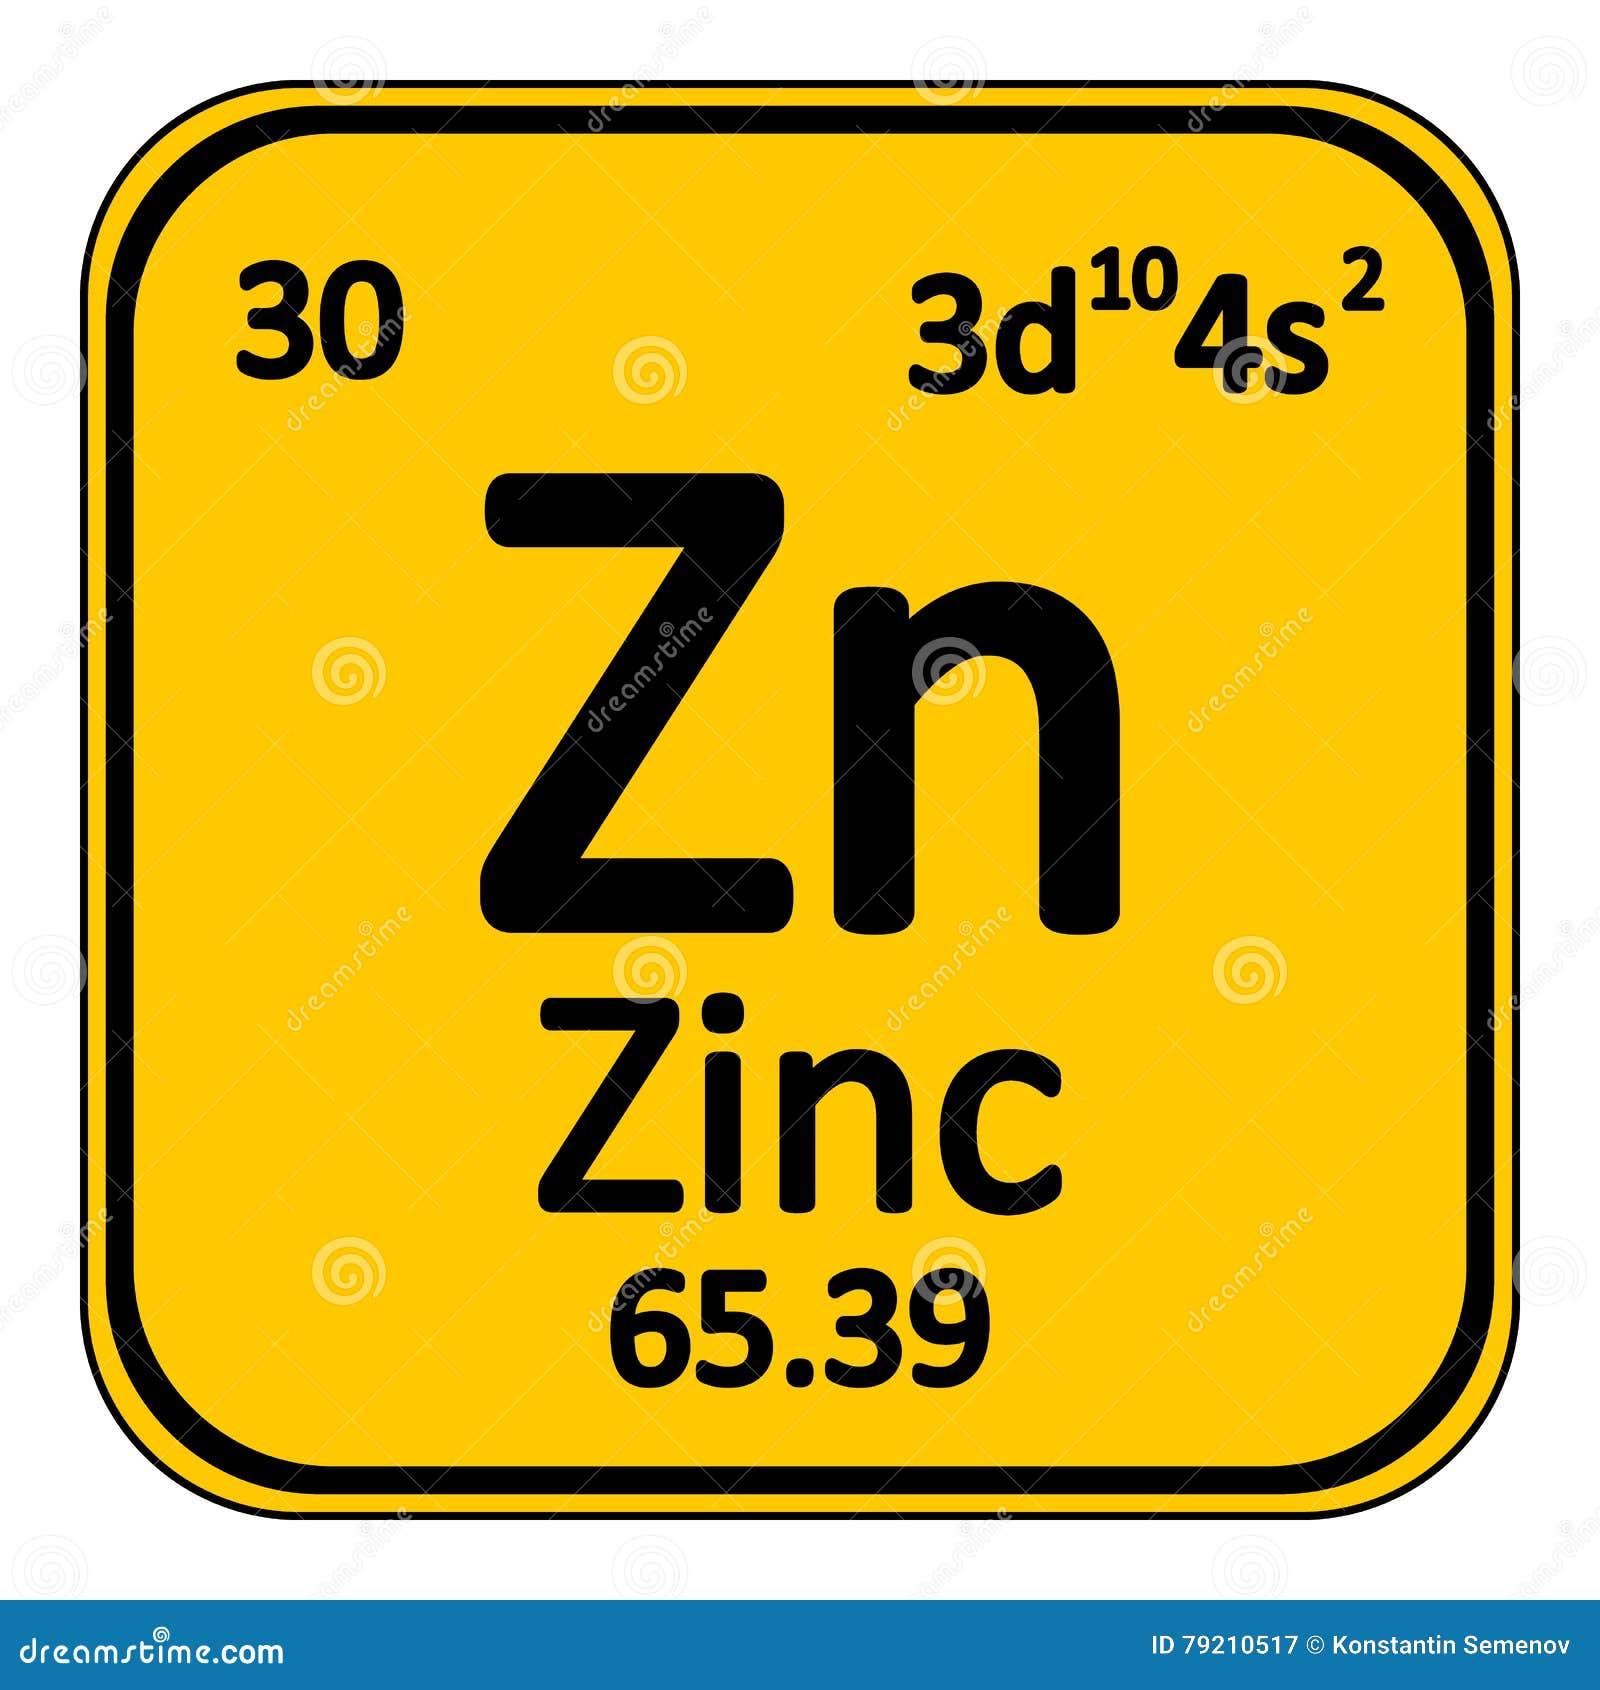 Periodic table element zinc icon stock illustration image 79210517 royalty free illustration download periodic table element zinc gamestrikefo Gallery